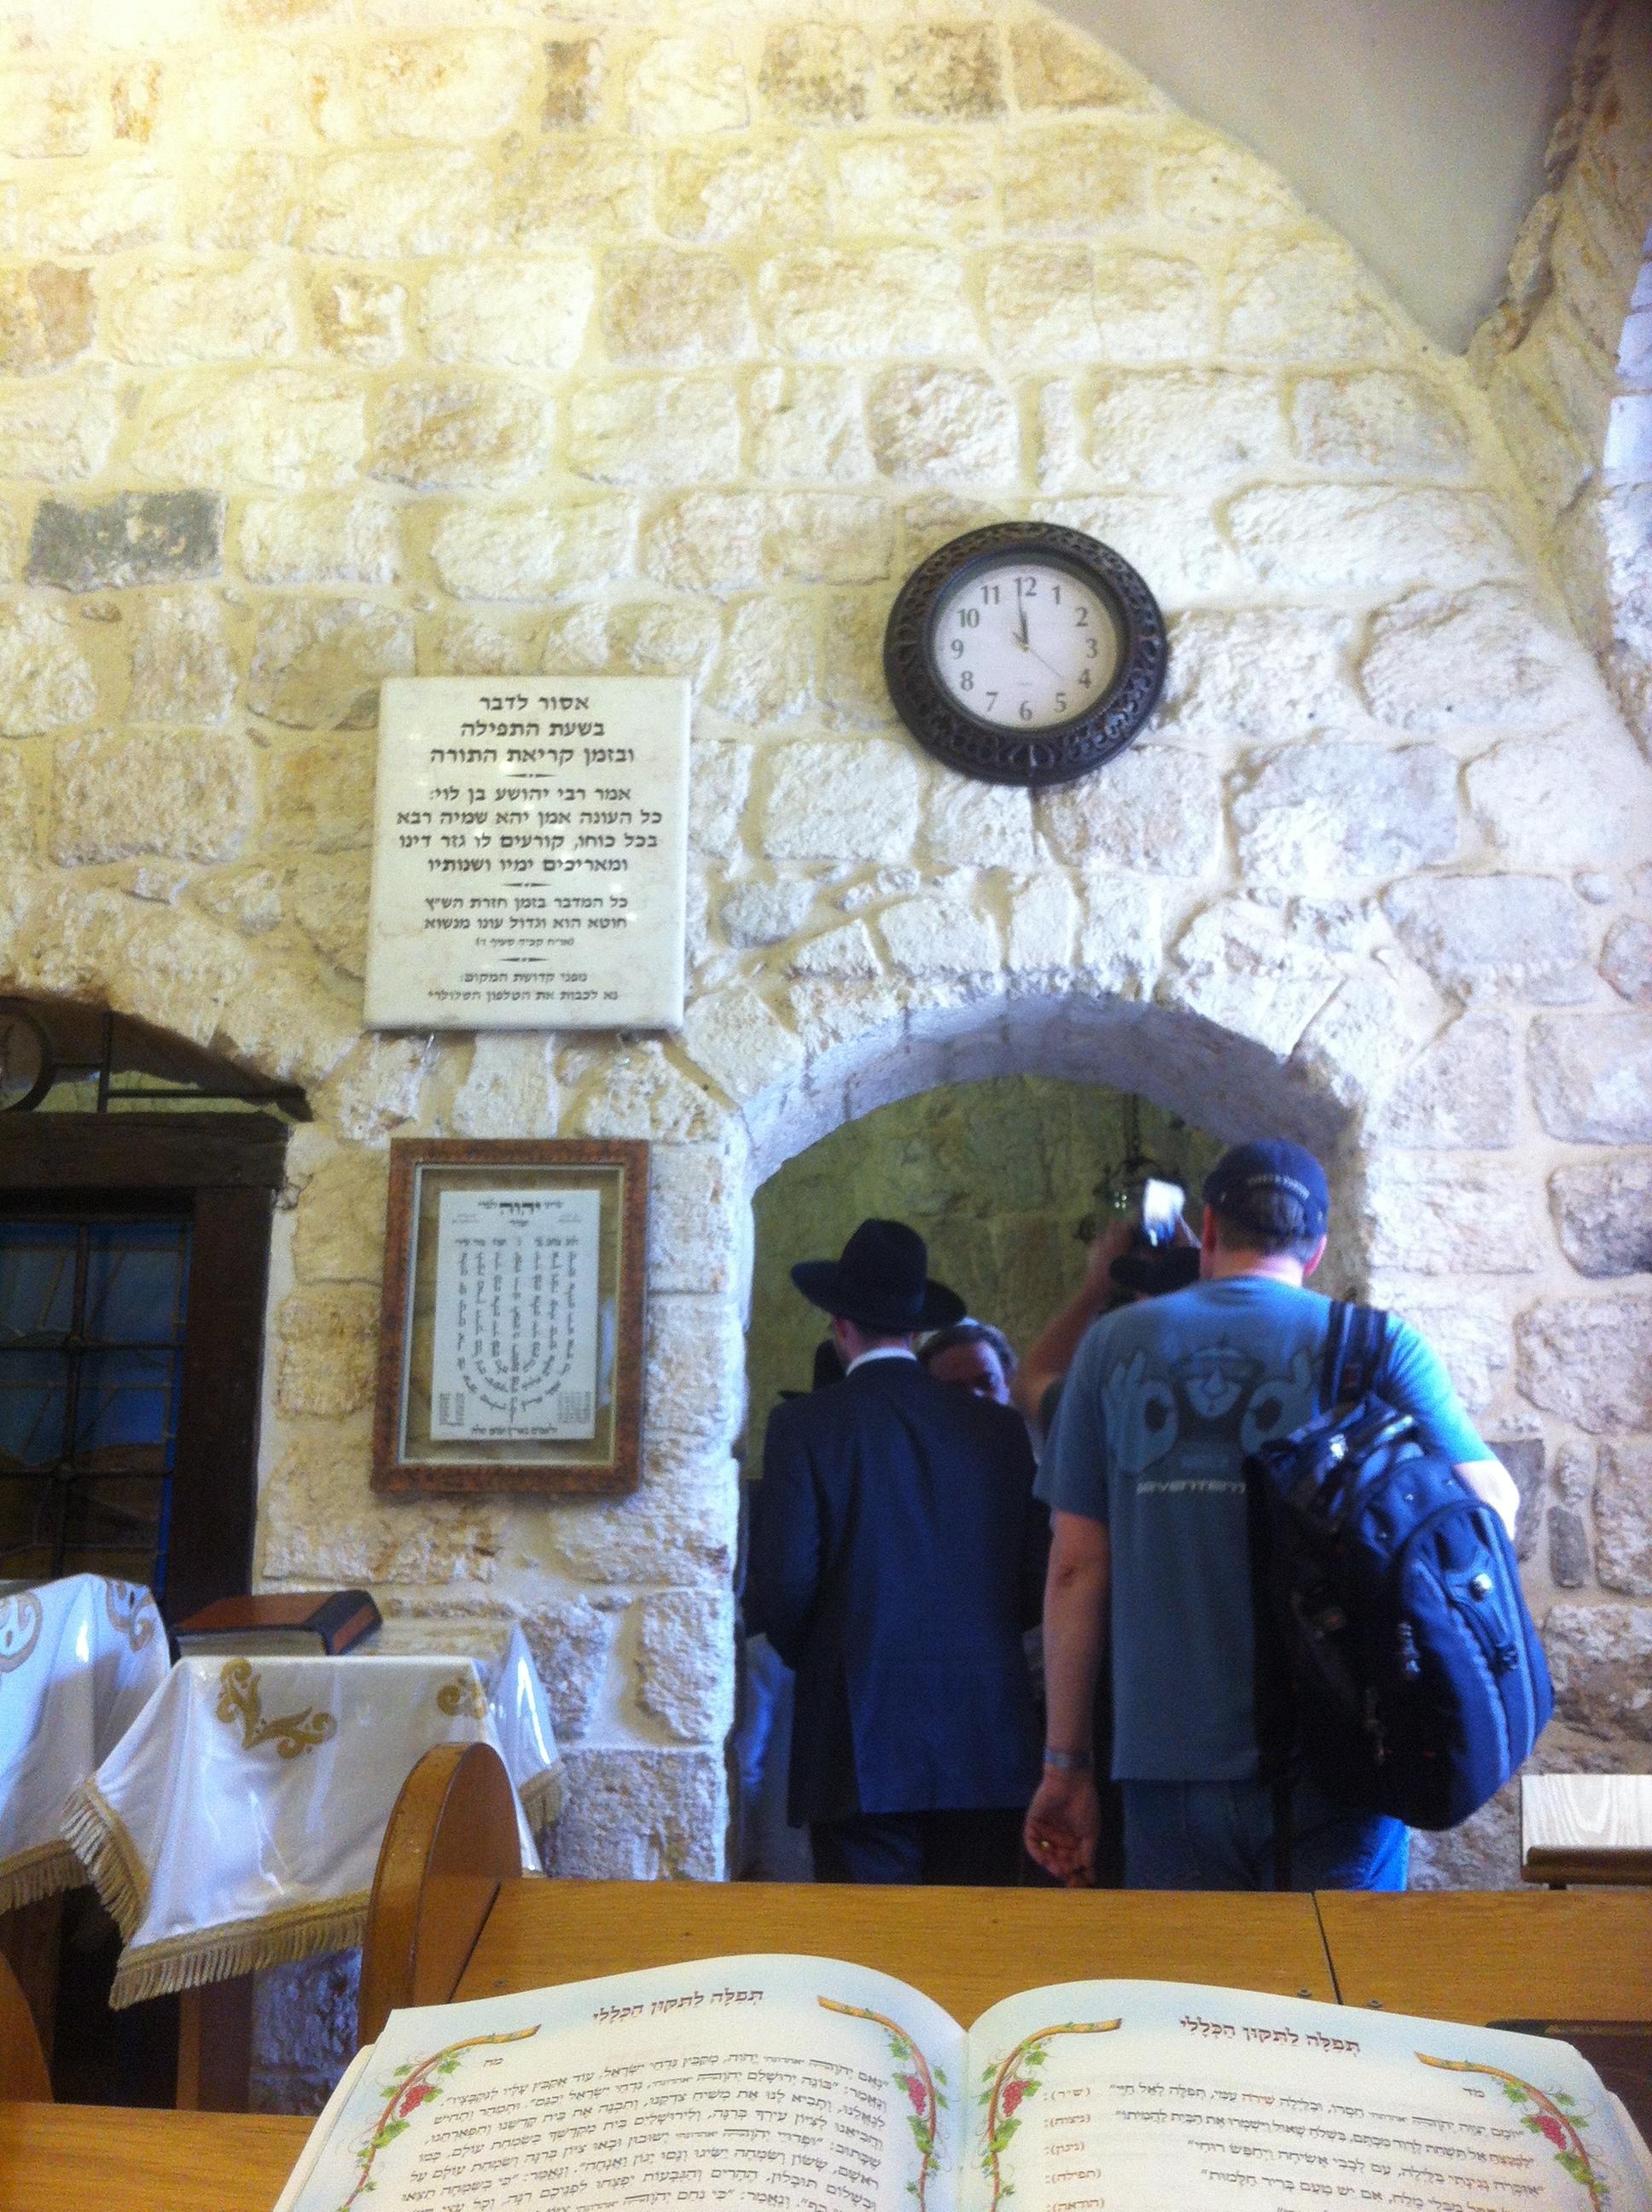 Jerusalem April 2017, reading from David